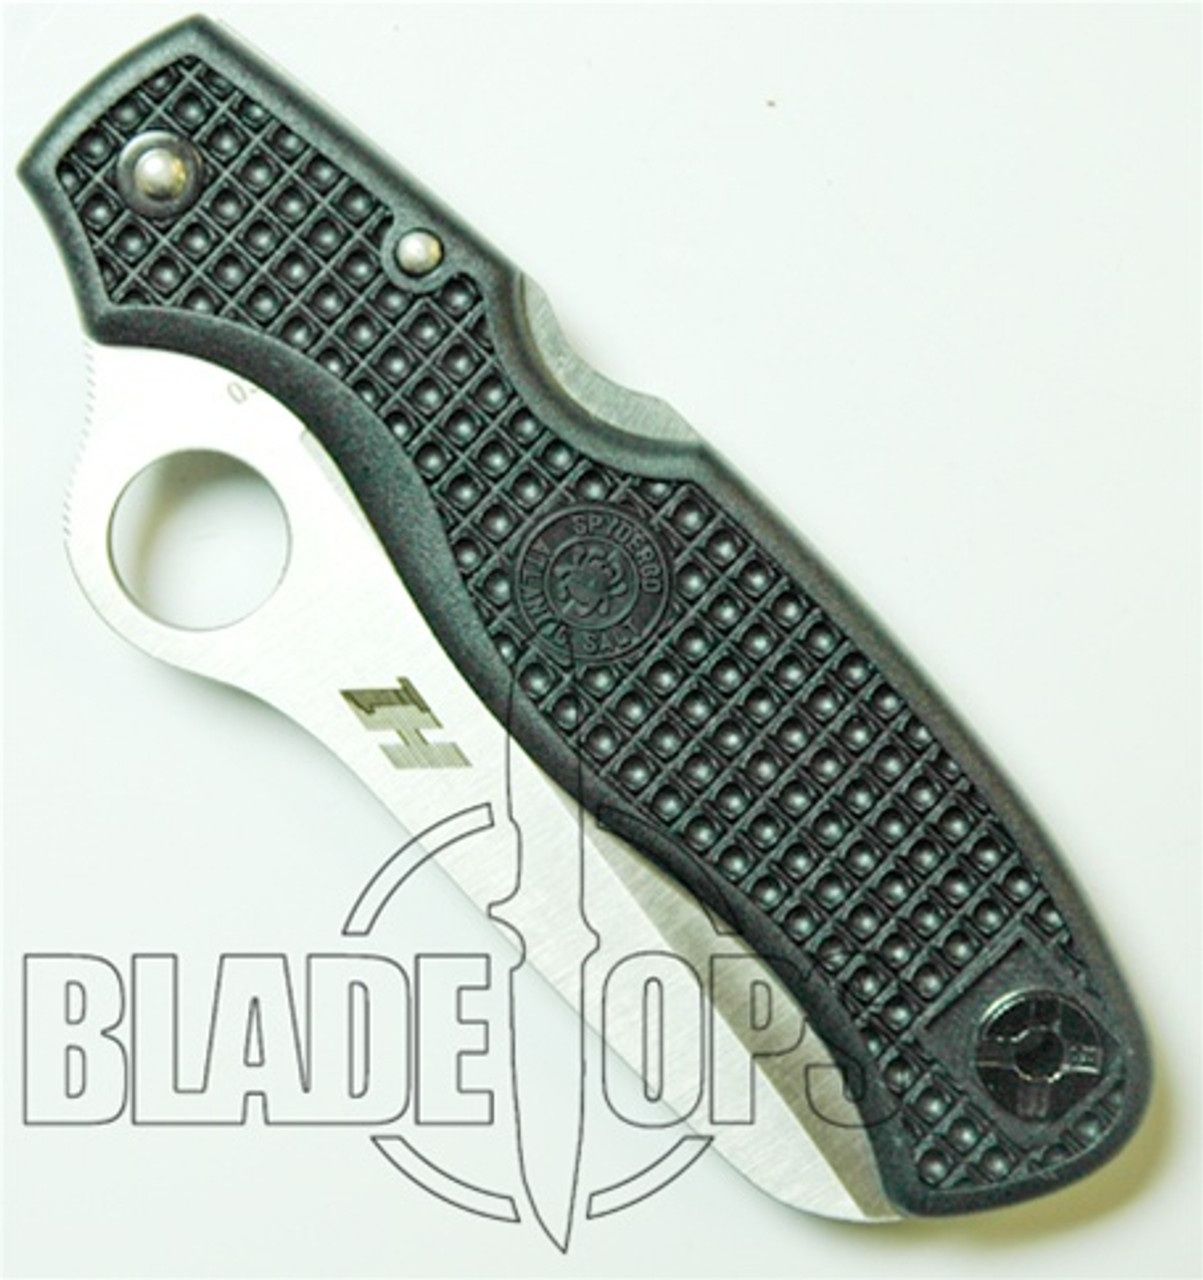 Spyderco Atlantic Salt Folding Lockback Knife, H1 Steel Plain Blade, Black FRN Handle, C89PBK